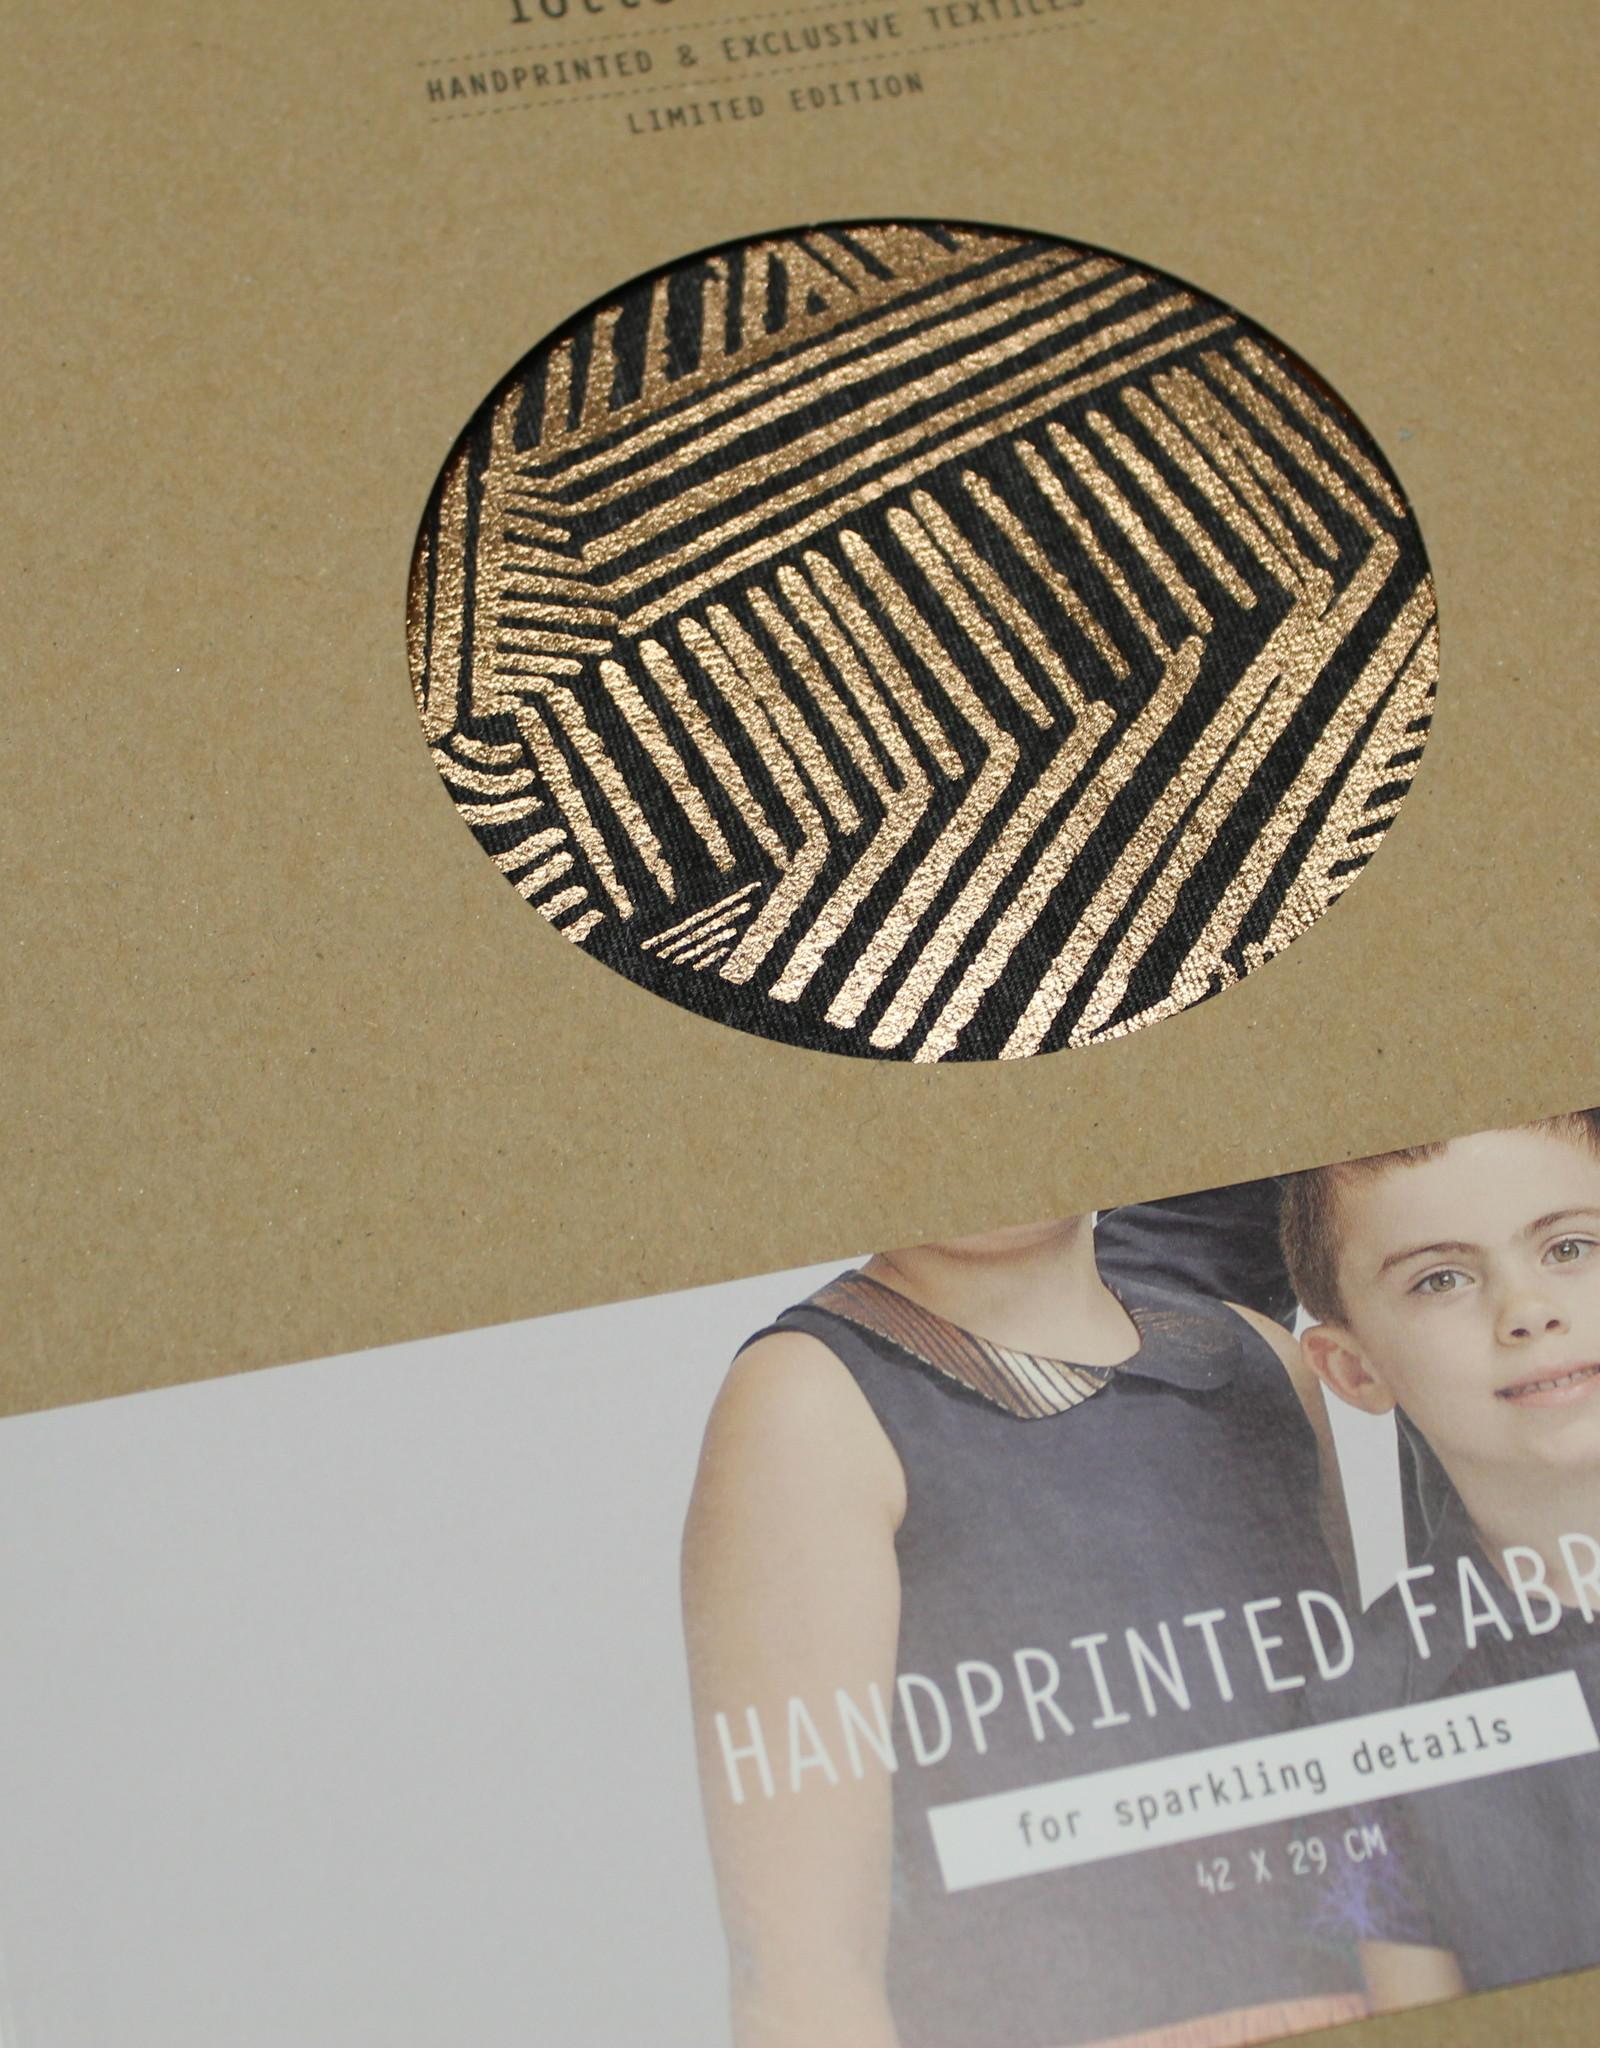 Lotte Martens Eye Candy Handprinted Fabric Punta di Roma Carex Dark Grey 42x29cm